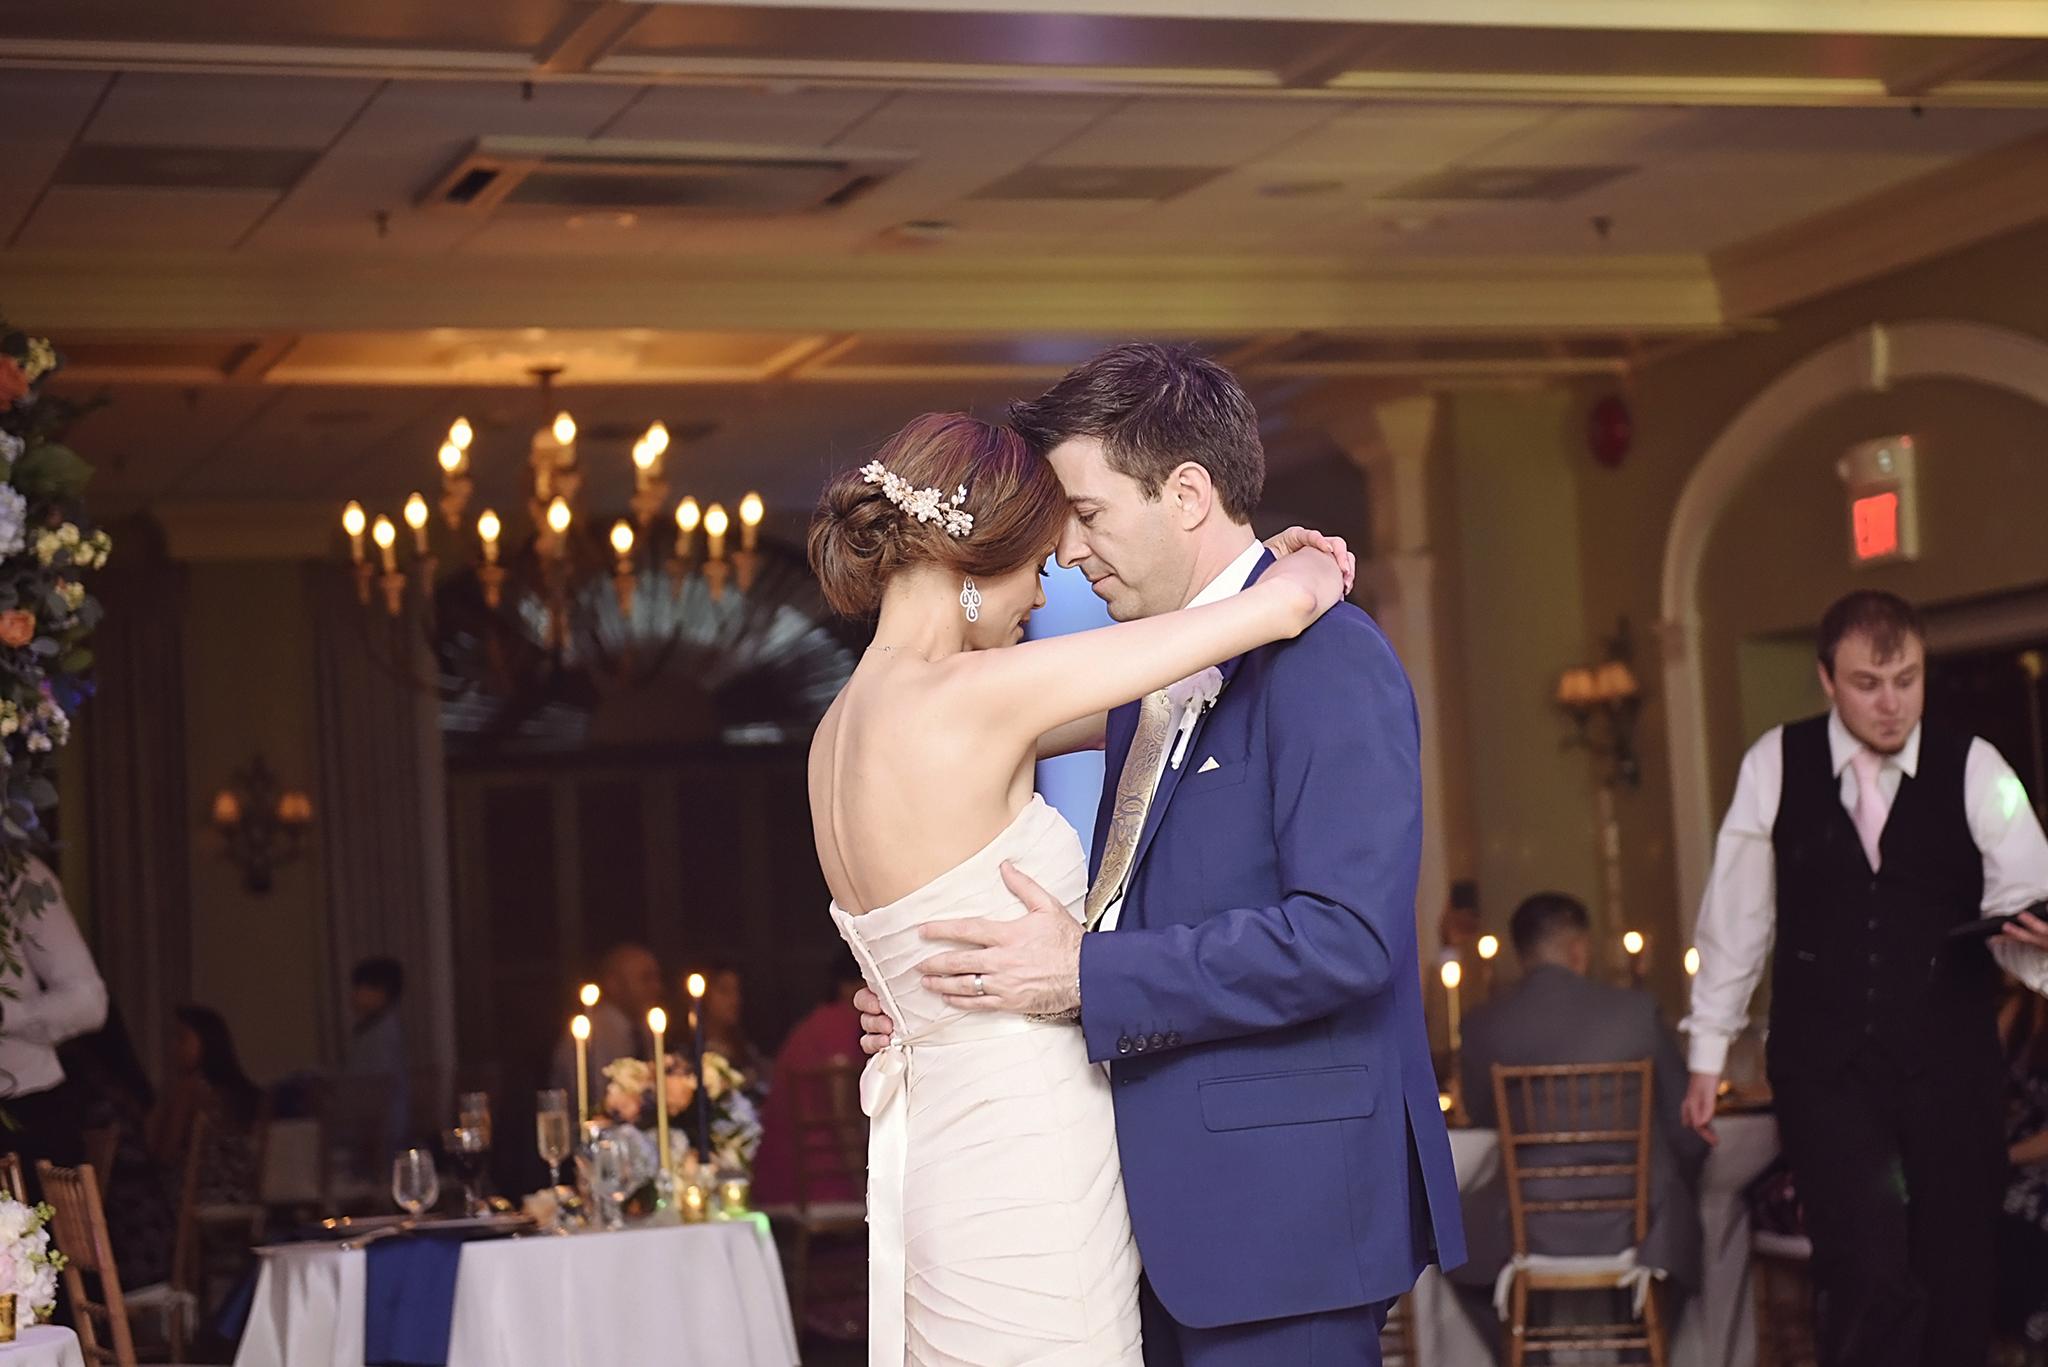 NJ-NY-wedding-photographer-142NJ-NY-wedding-photographer-142NJ-NY-WEDDING-PHOTOGRAPHER-142.JPG